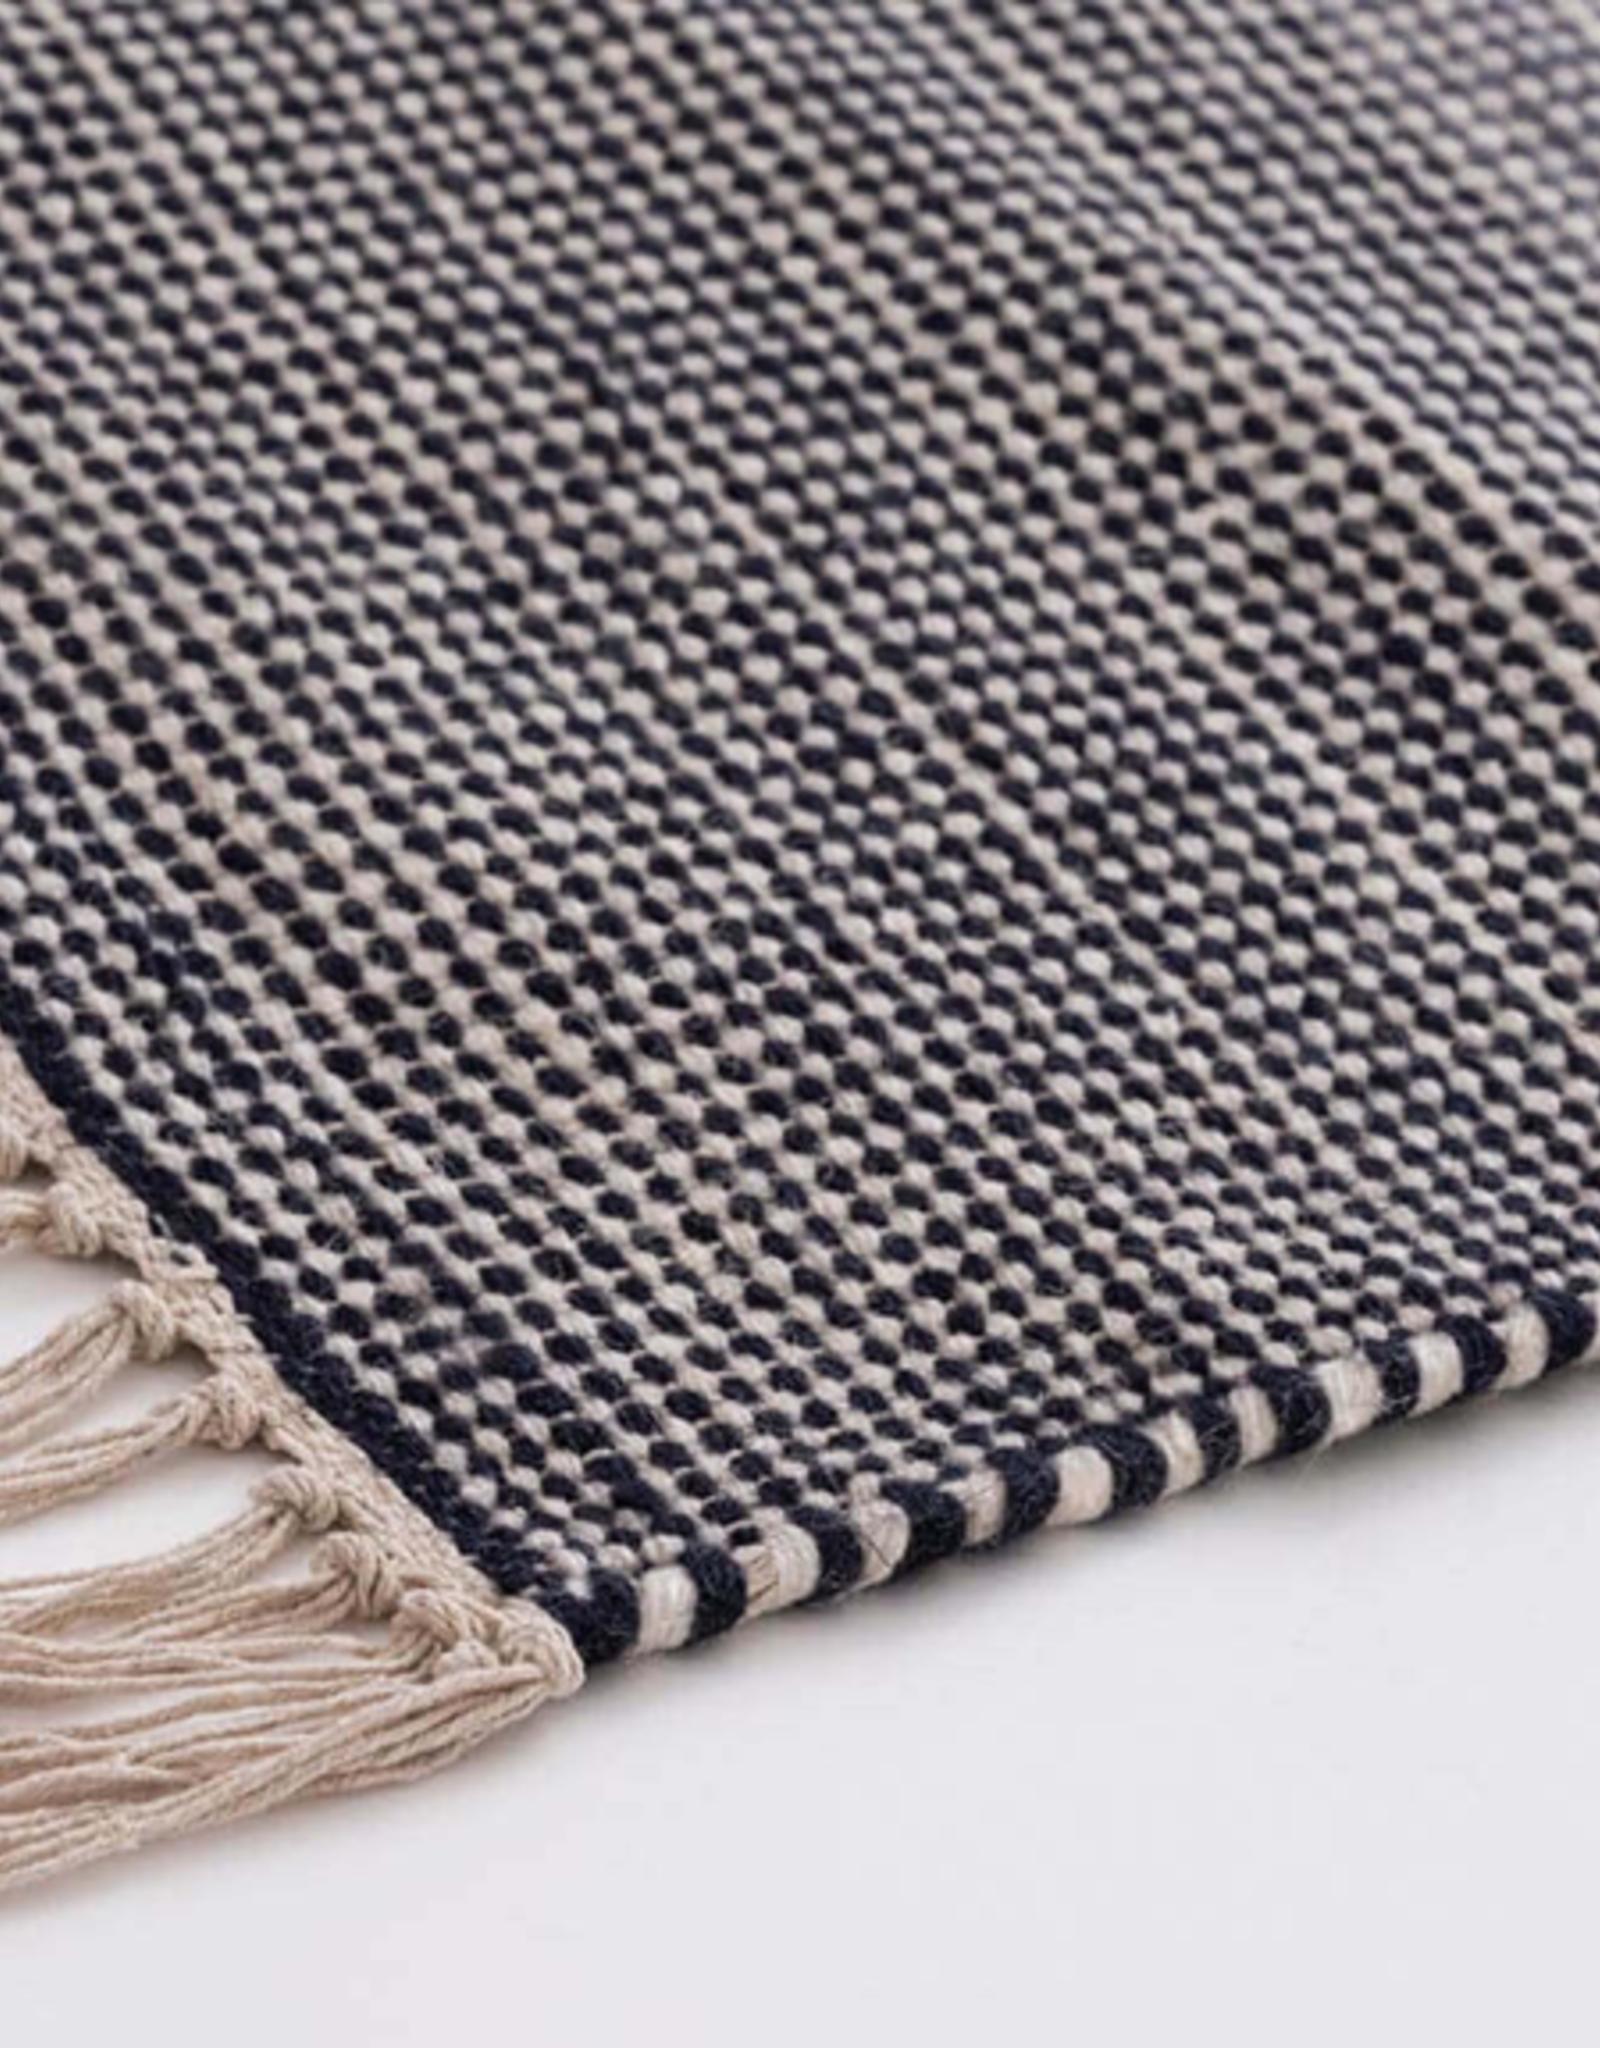 Shore Rug 6x9 100% Wool